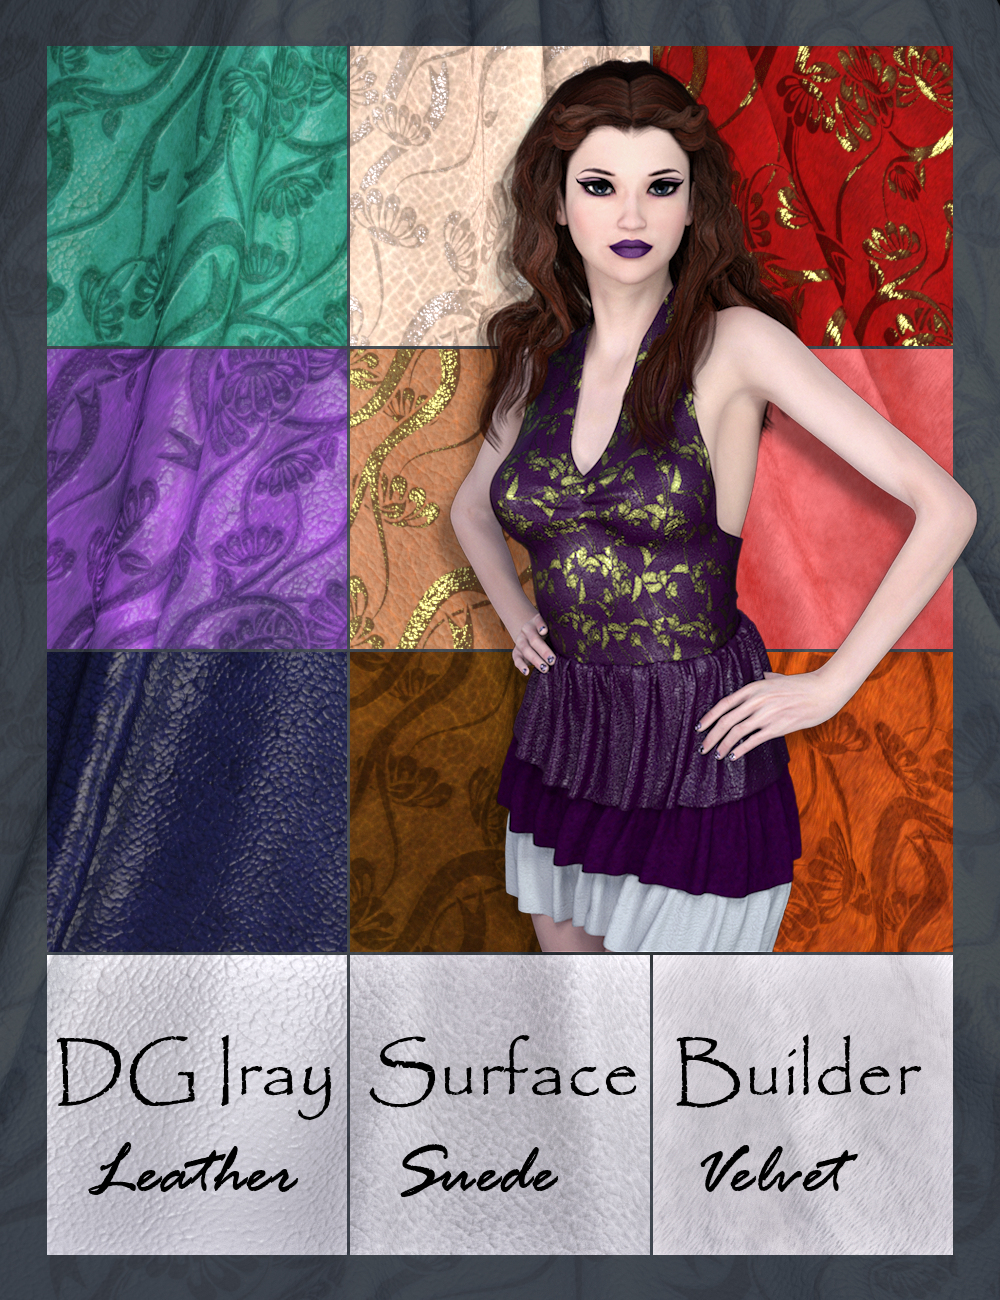 DG Iray Surface Builder - Leather Suede Velvet - Shaders and Merchant Resource by: IDG DesignsDestinysGarden, 3D Models by Daz 3D